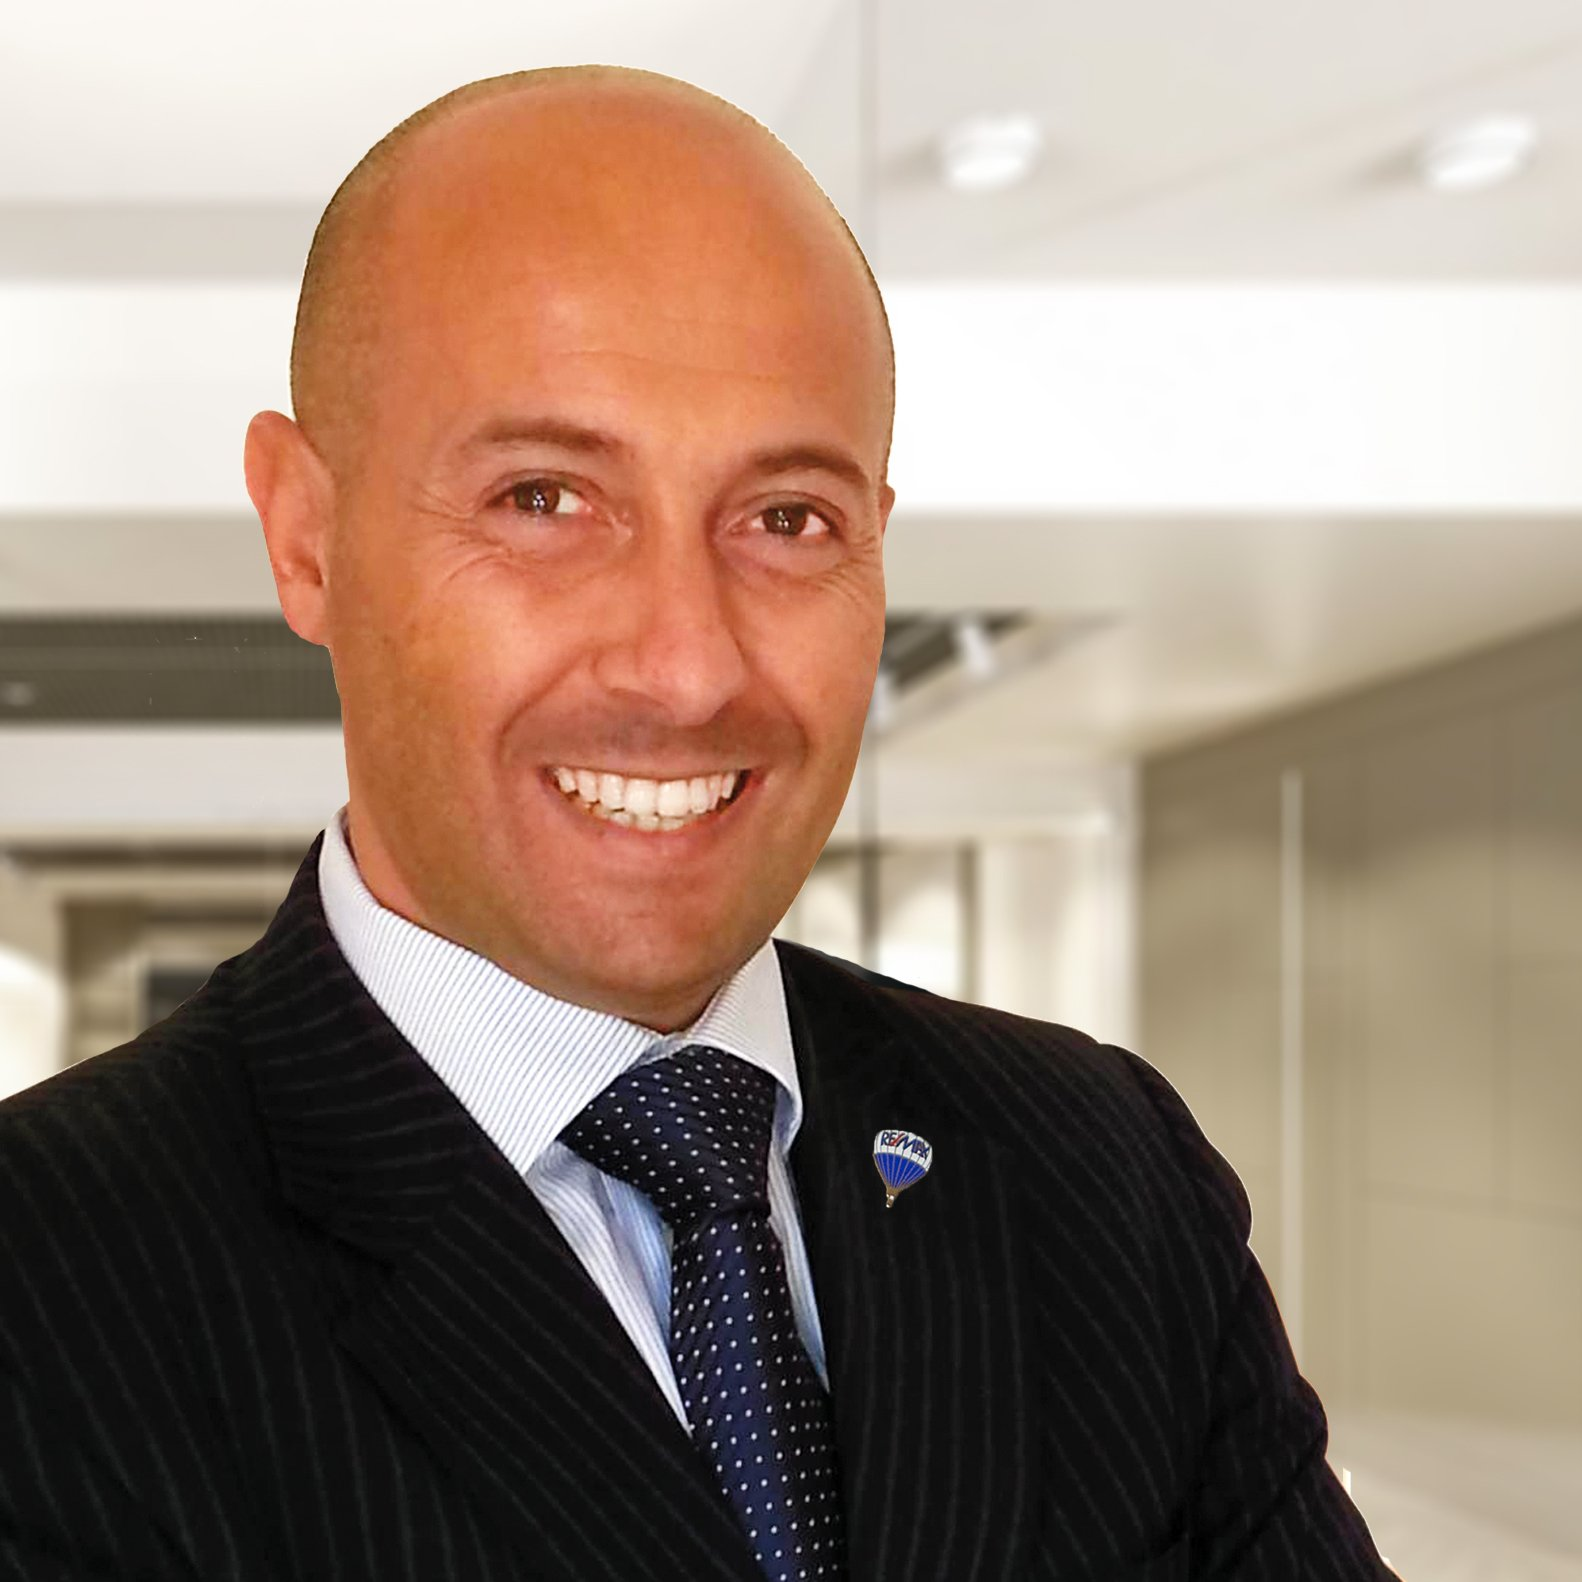 Luigi Sghinolfi Consulente Immobiliare Remax